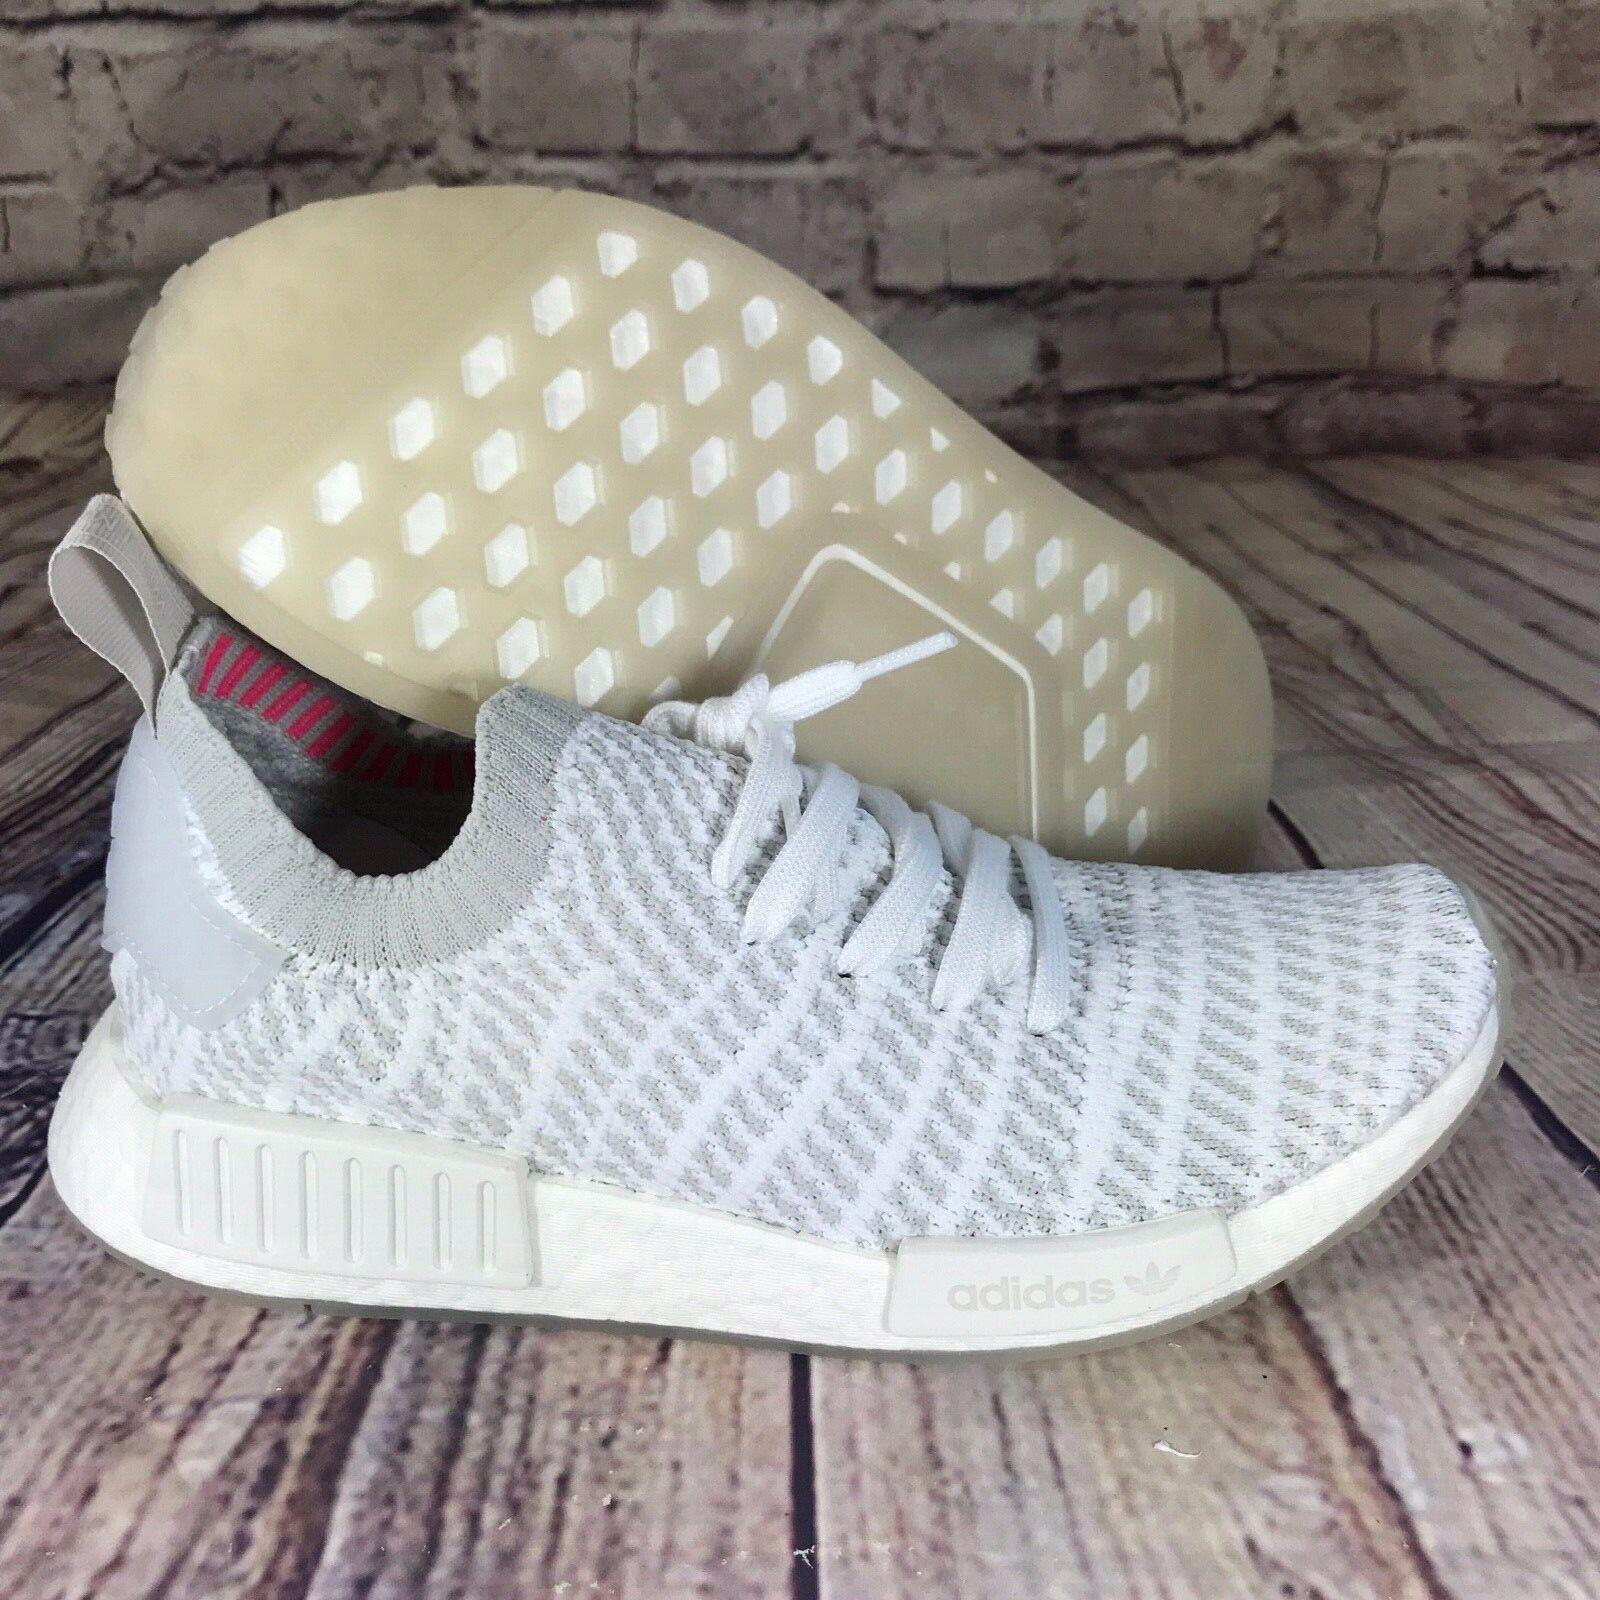 Adidas Primeknit Cq2390 R1 Pk Whitegreypink Shoes Nmd Stlt GLzpjSUMVq